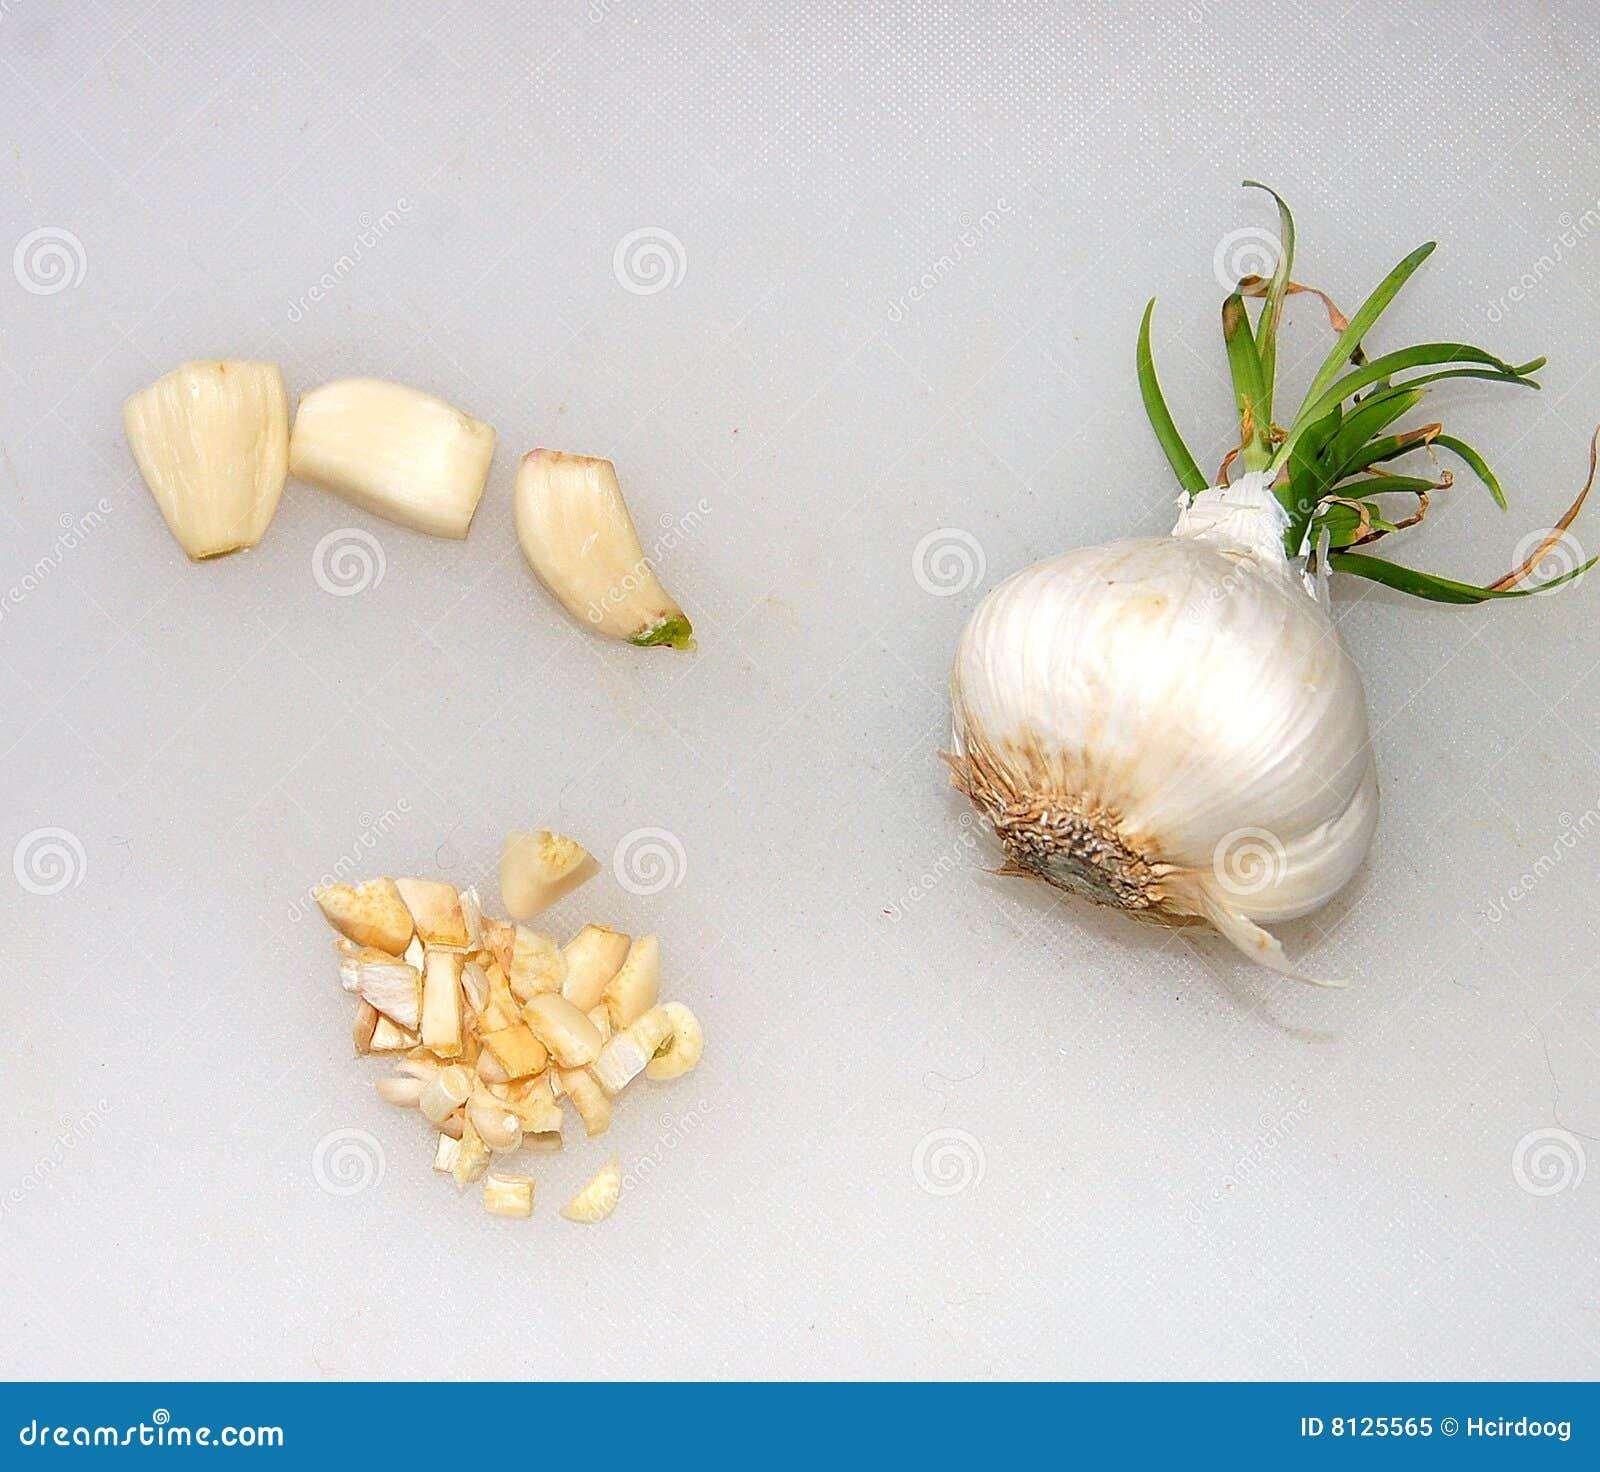 Garlic pieces and garlic bulb